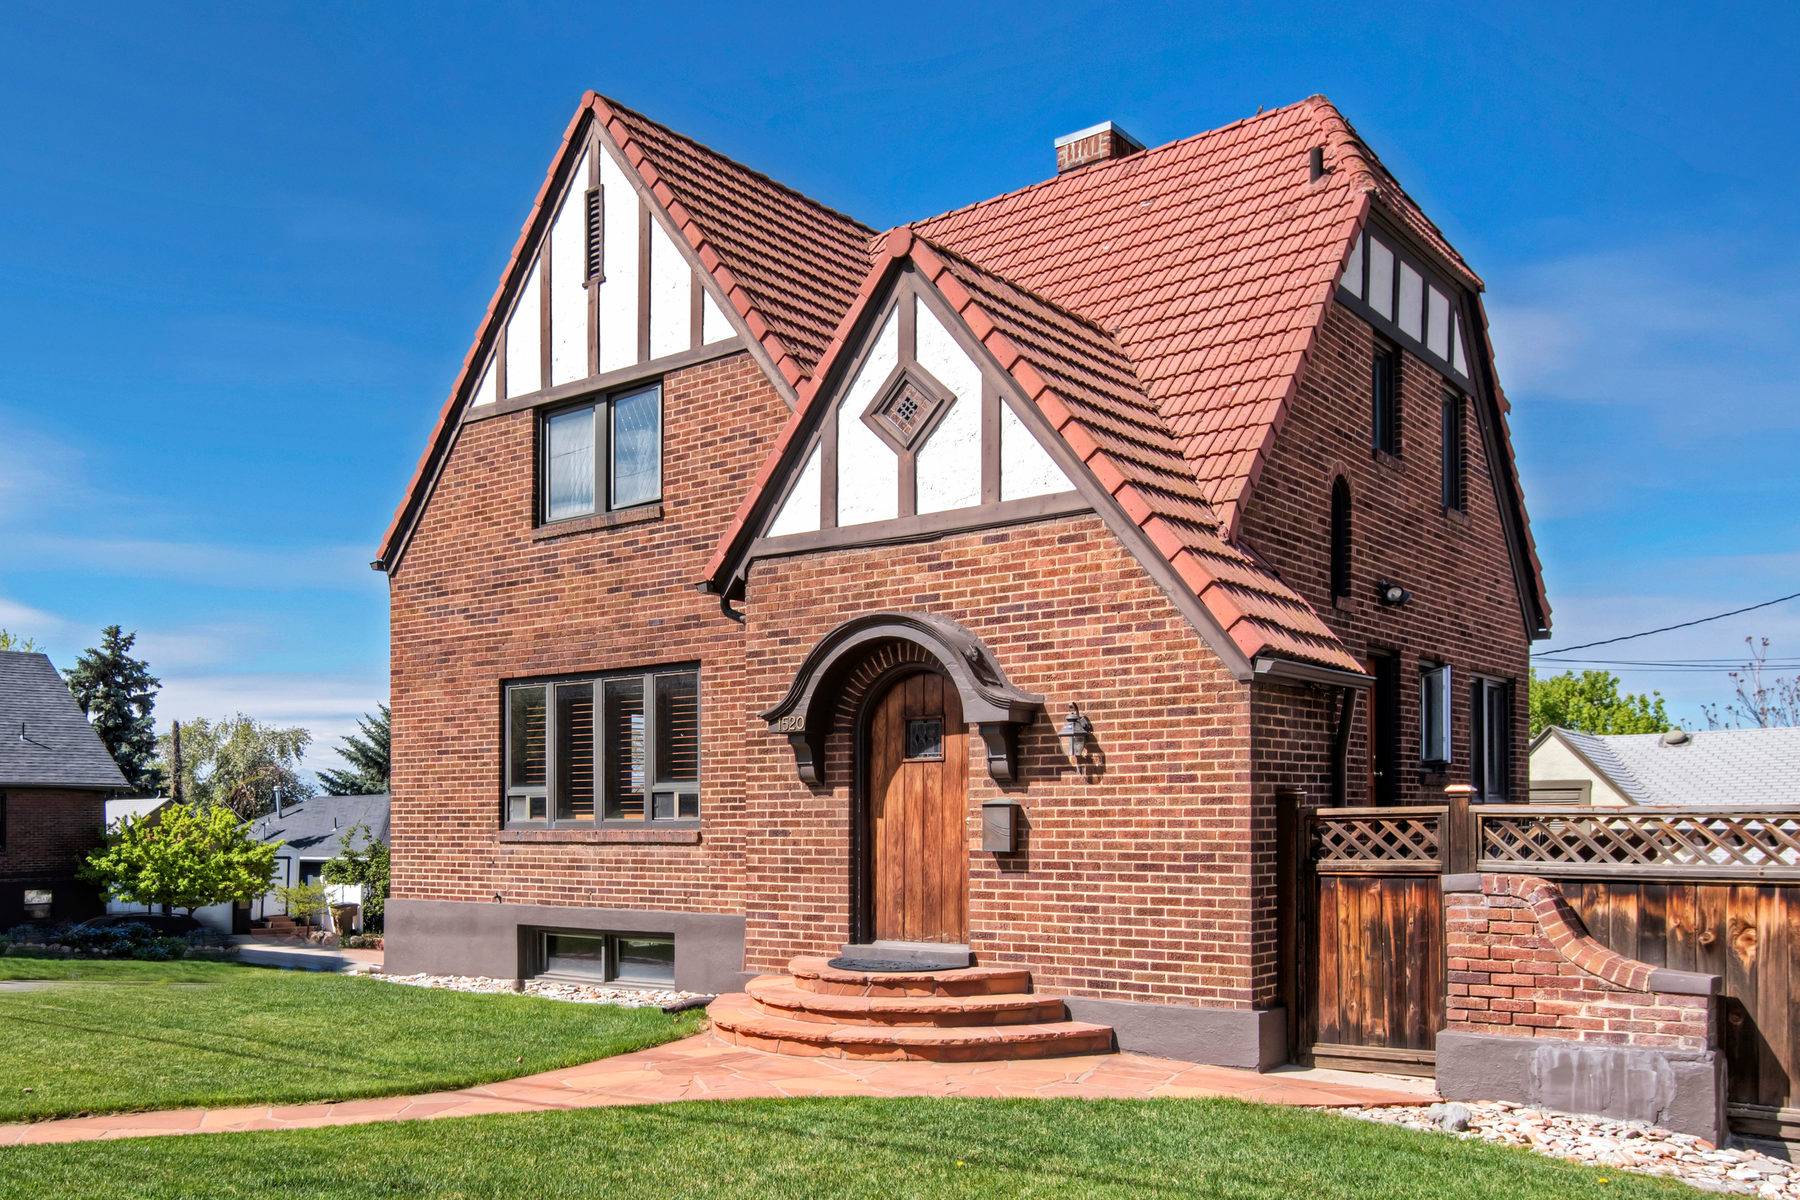 独户住宅 为 销售 在 Classic Sugarhouse Tudor 1520 South 1300 East 盐湖城市, 犹他州, 84105 美国